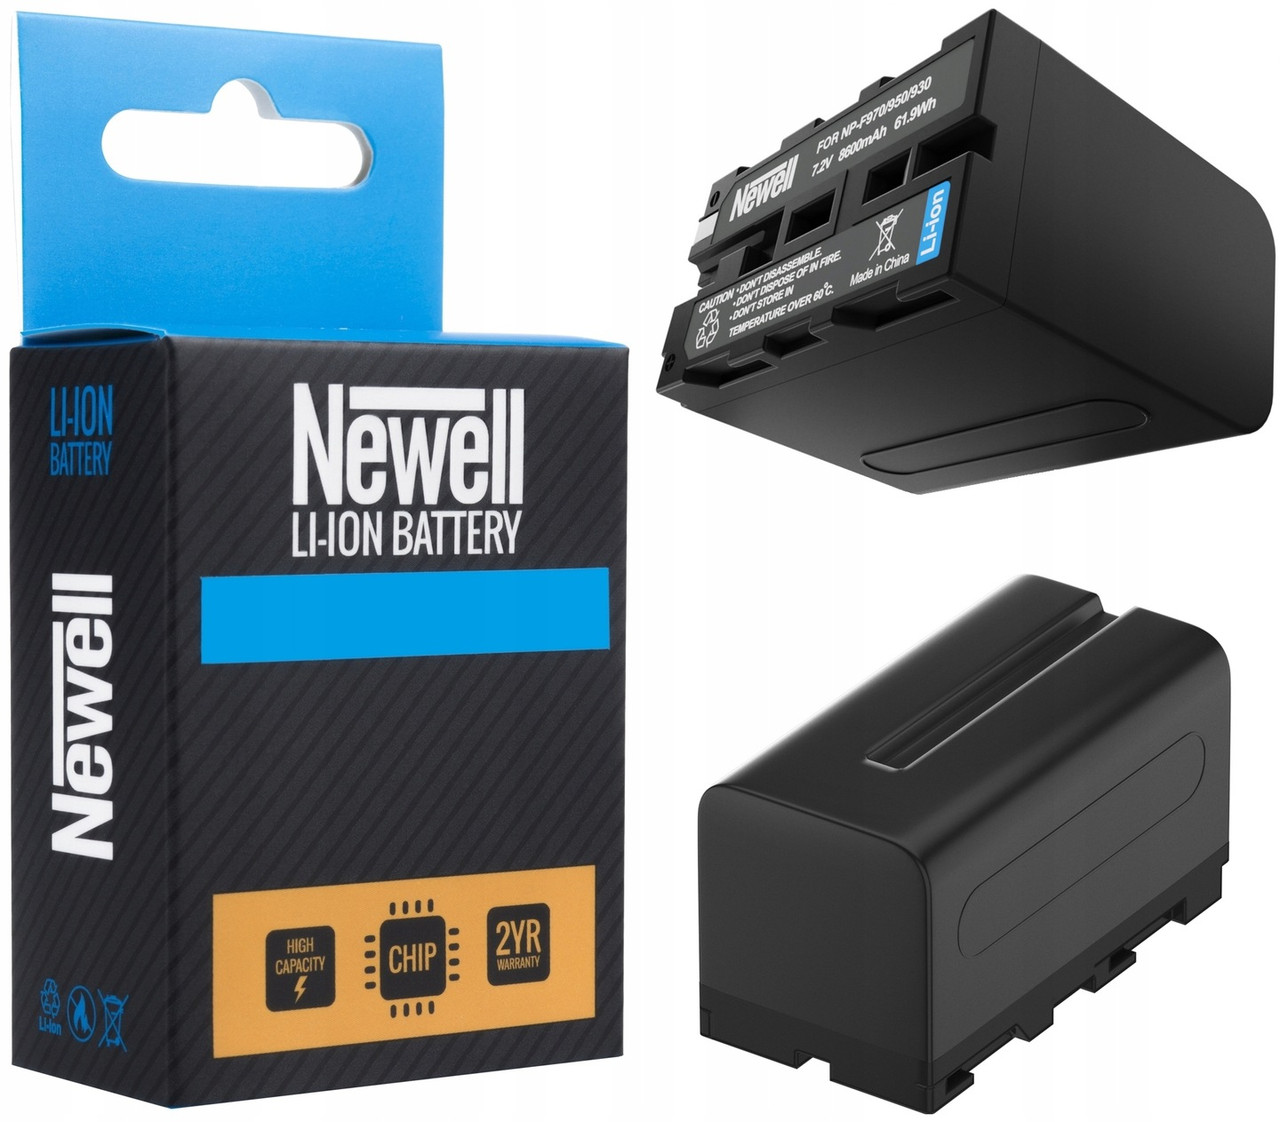 Акумулятор Newell li-ion battery for NP-F970 6600 mAh (BDS2652) ExtraDigital для фото відео